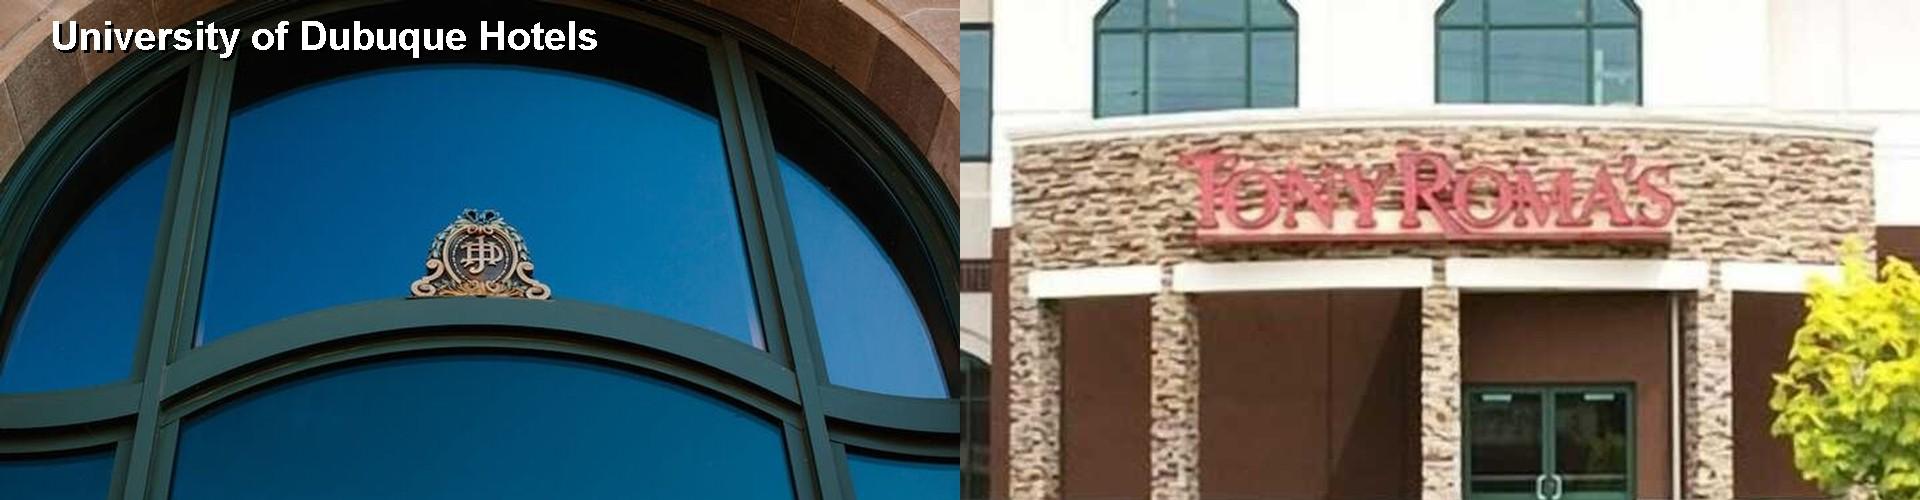 5 Best Hotels Near University Of Dubuque